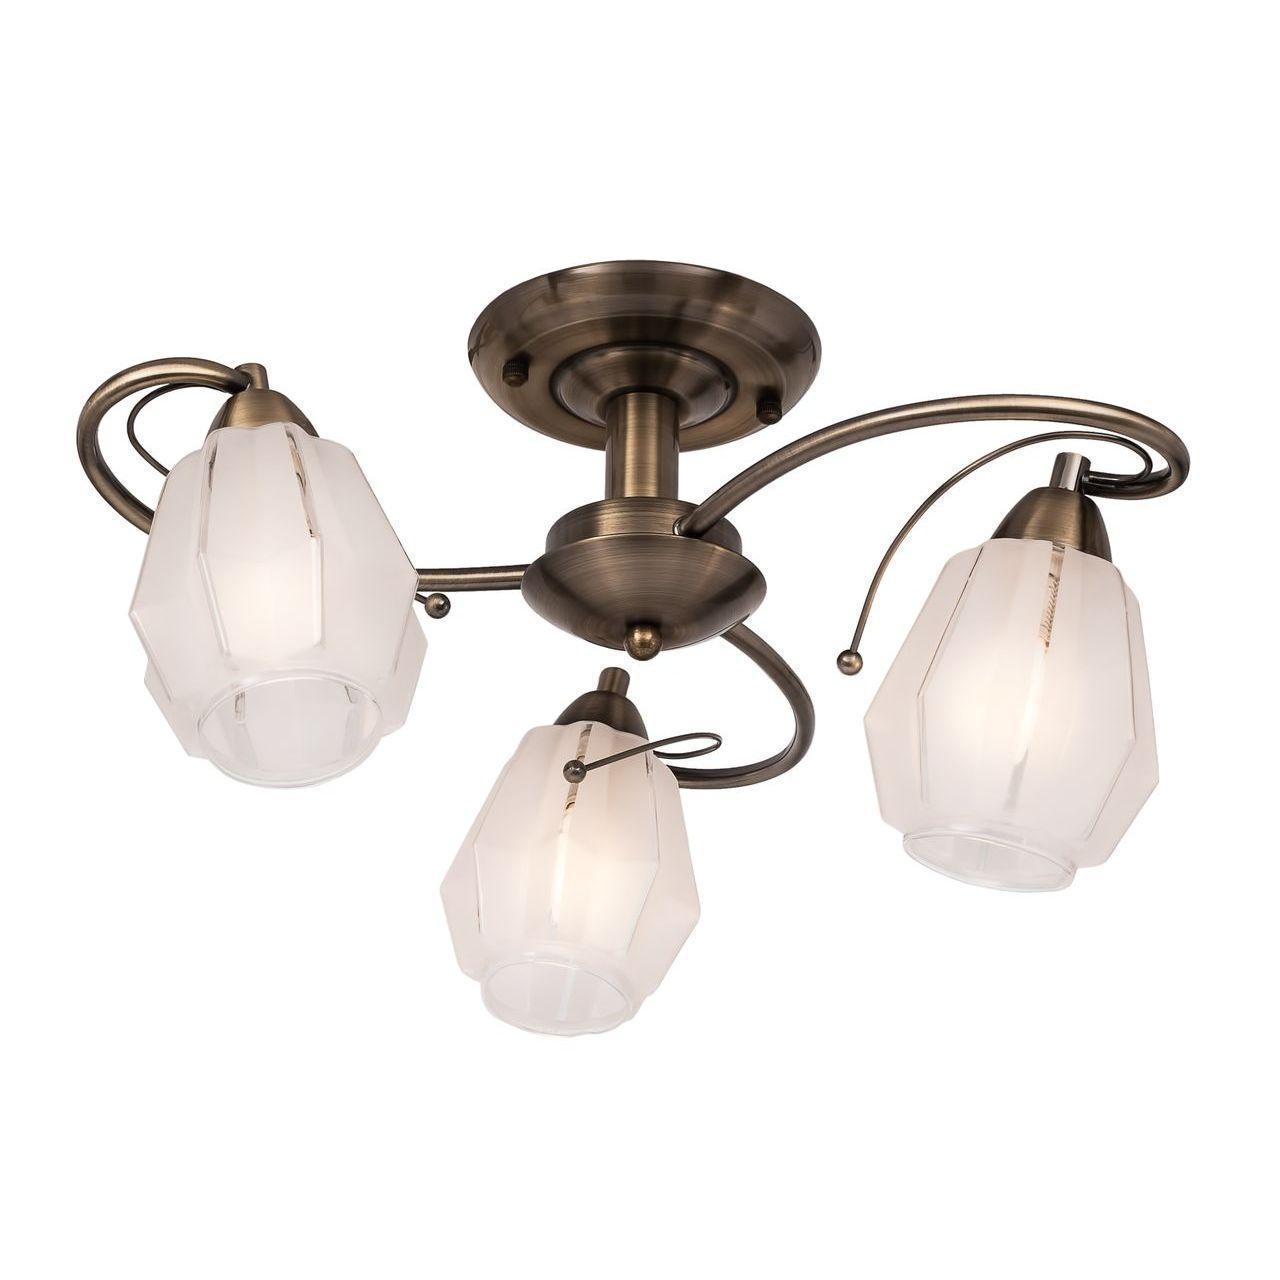 Люстра Silver Light Brazil 506.53.3 потолочная потолочная люстра silver light rhombus 201 54 12